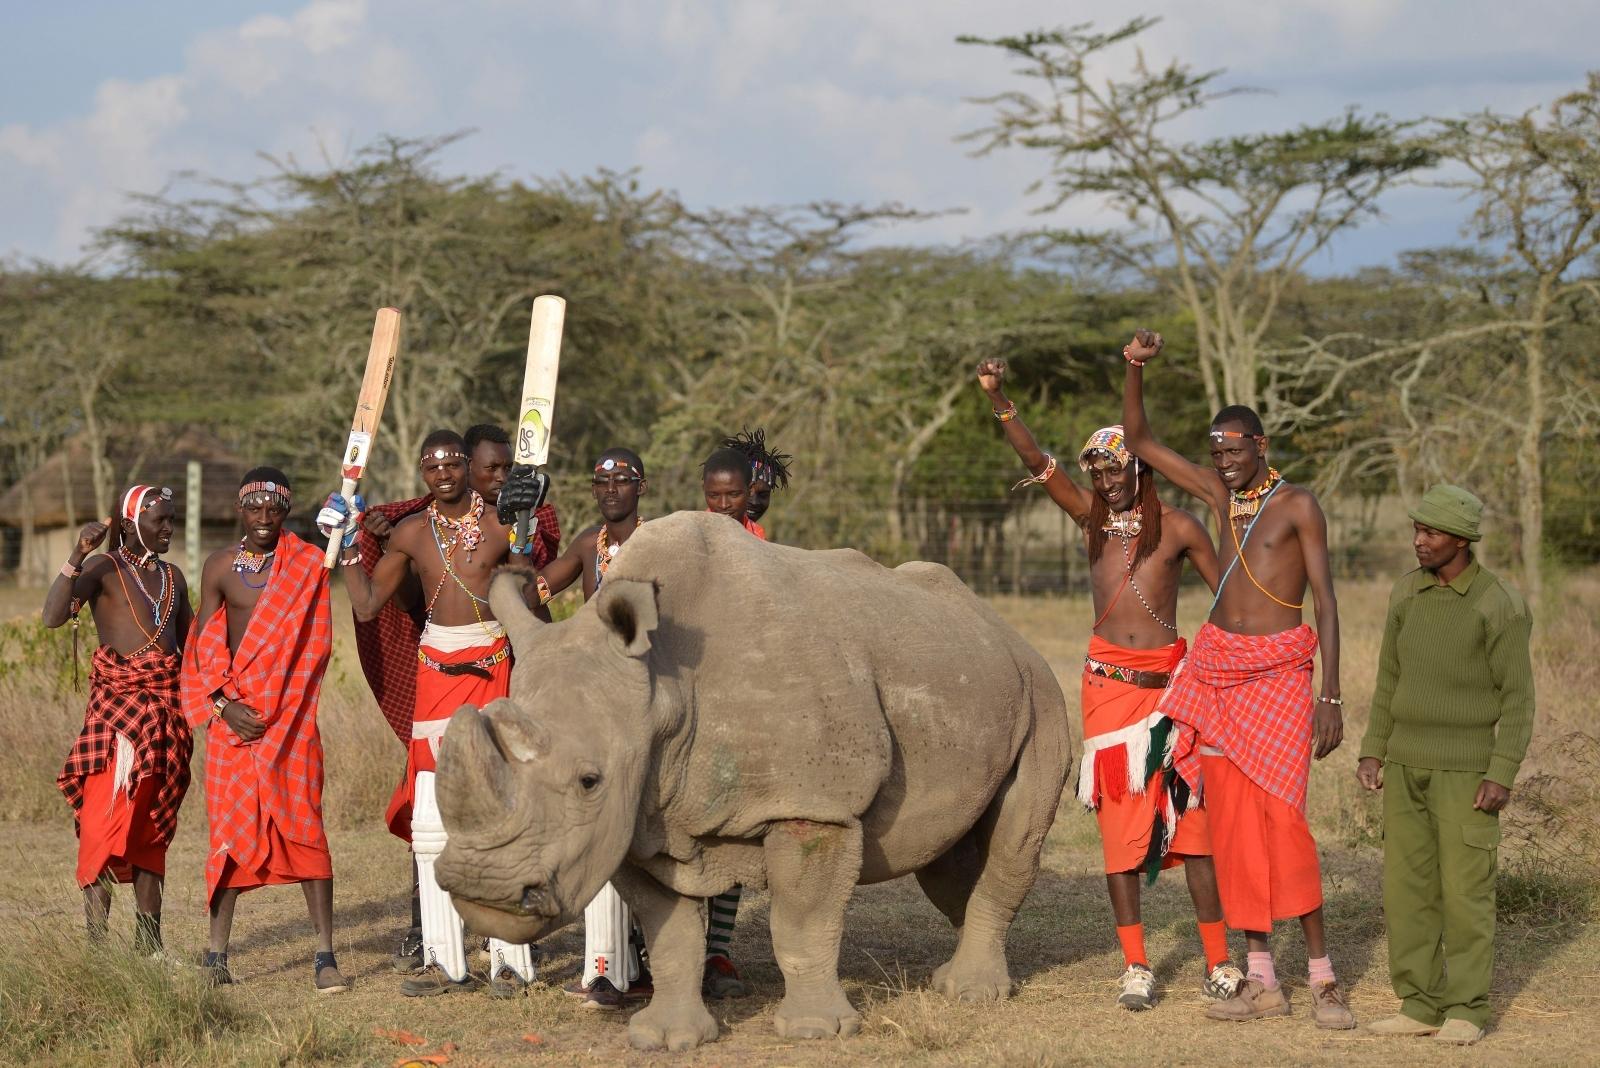 Endangered rhino with Maasai warriors in Kenya